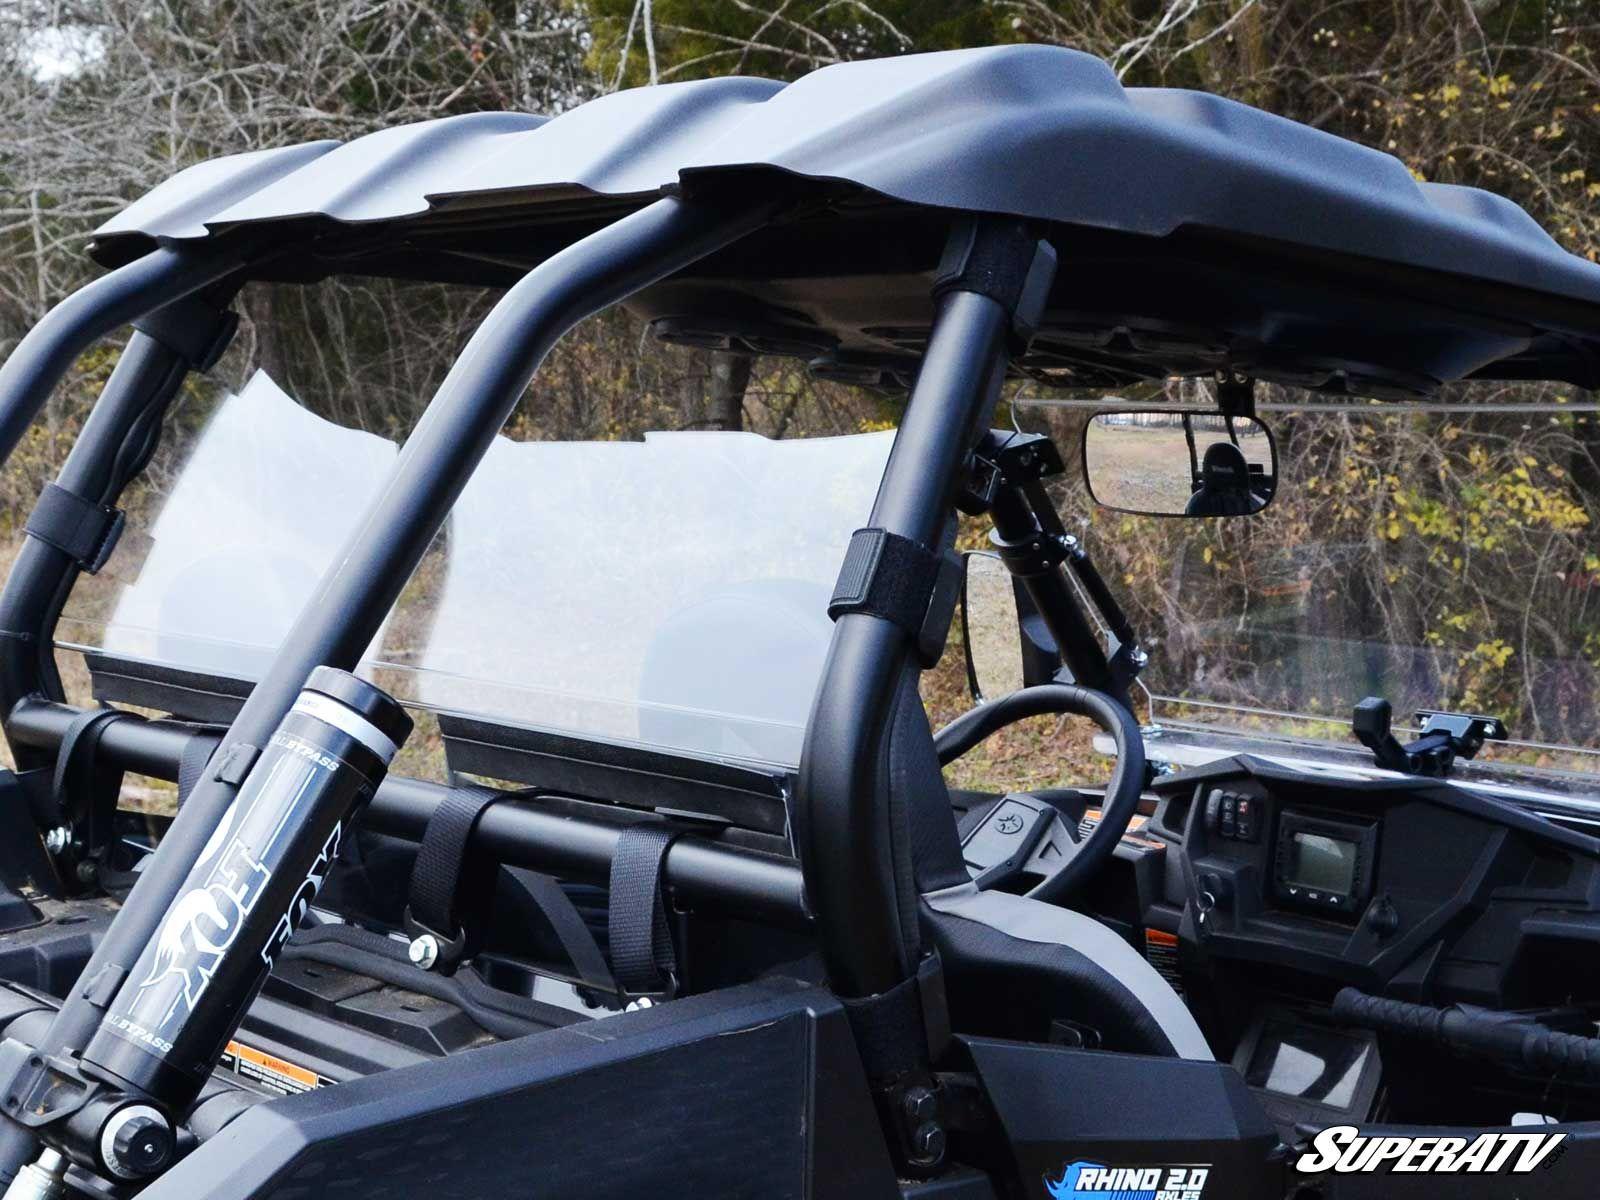 SuperATV Polaris RZR XP 1000 XP 1000 4 Seater, XP Turbo, XP Turbo 4 Seater Rear Windshield